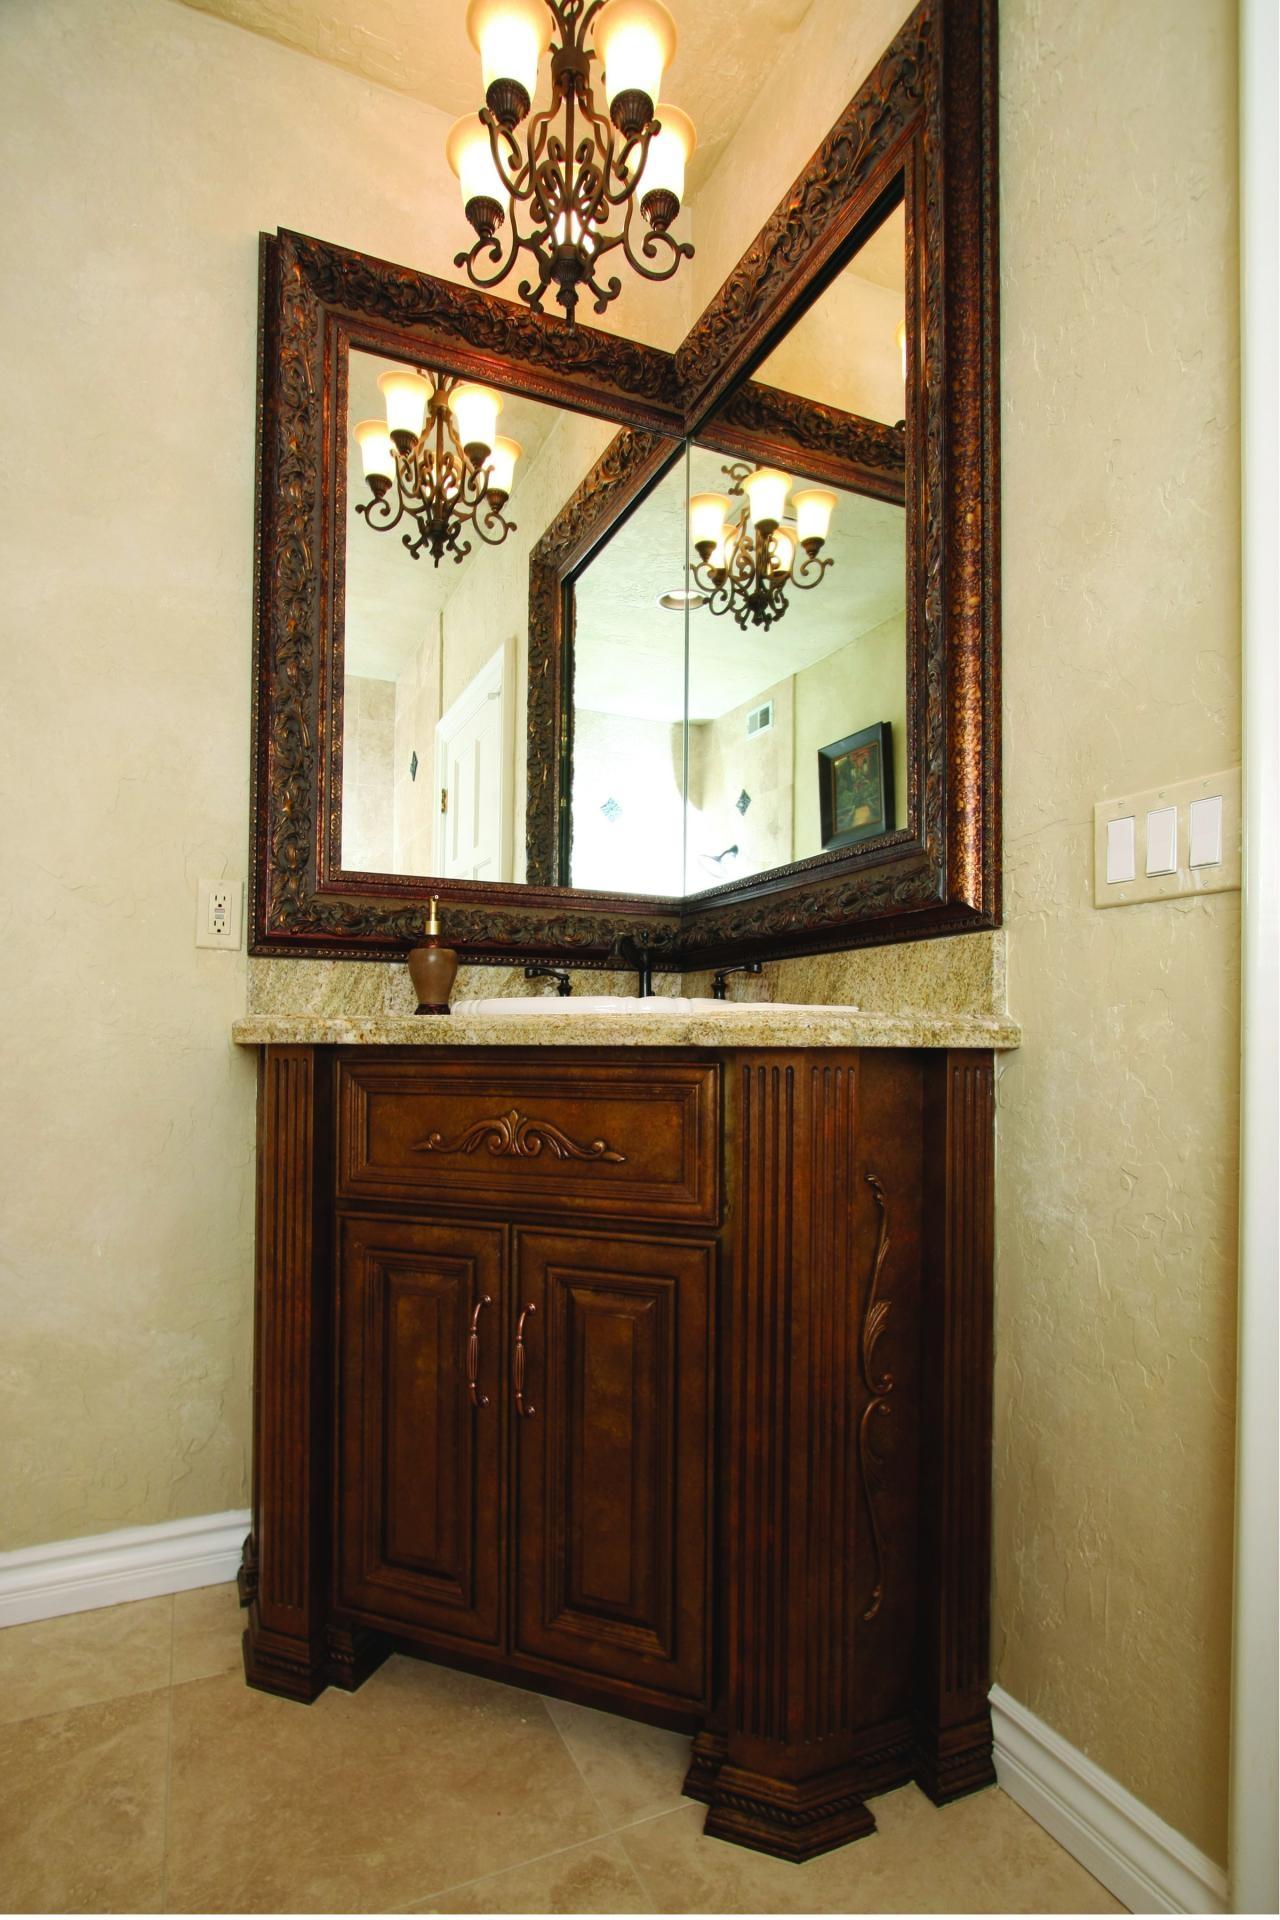 Wooden Mirrored Corner Bathroom Cabinet